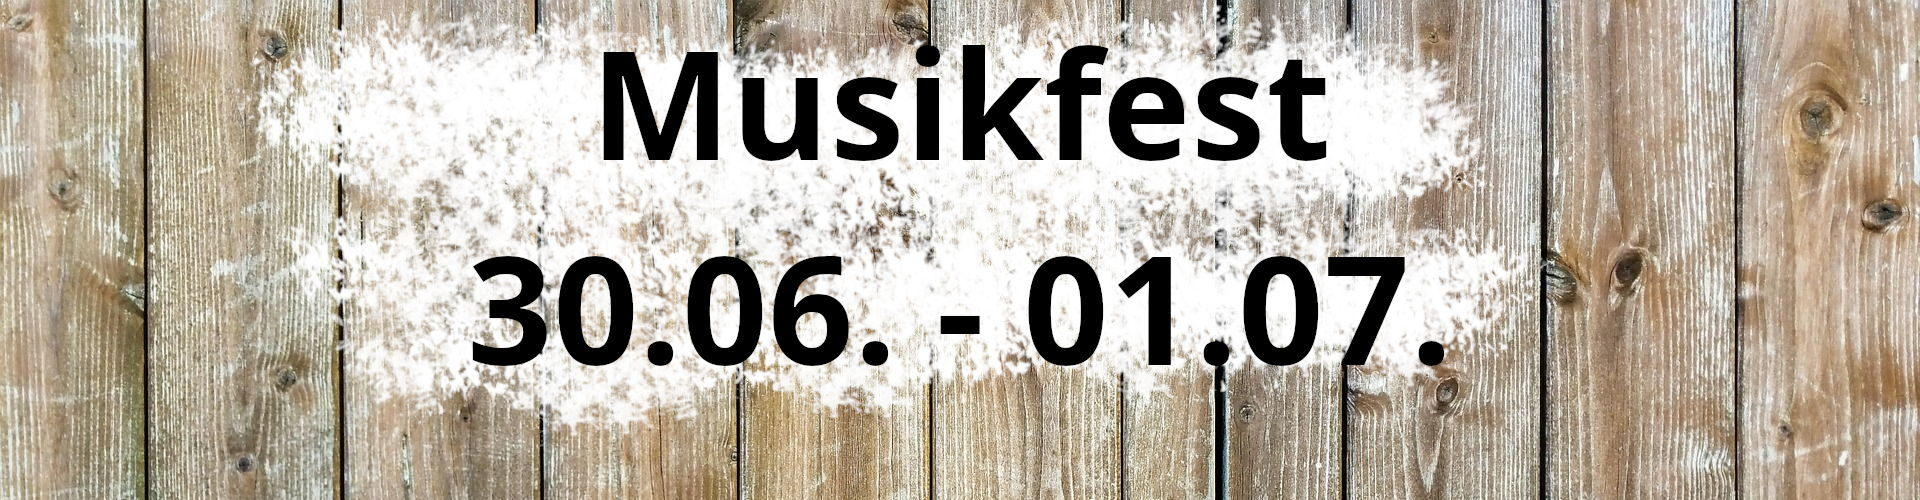 Titel Musikfest 2019